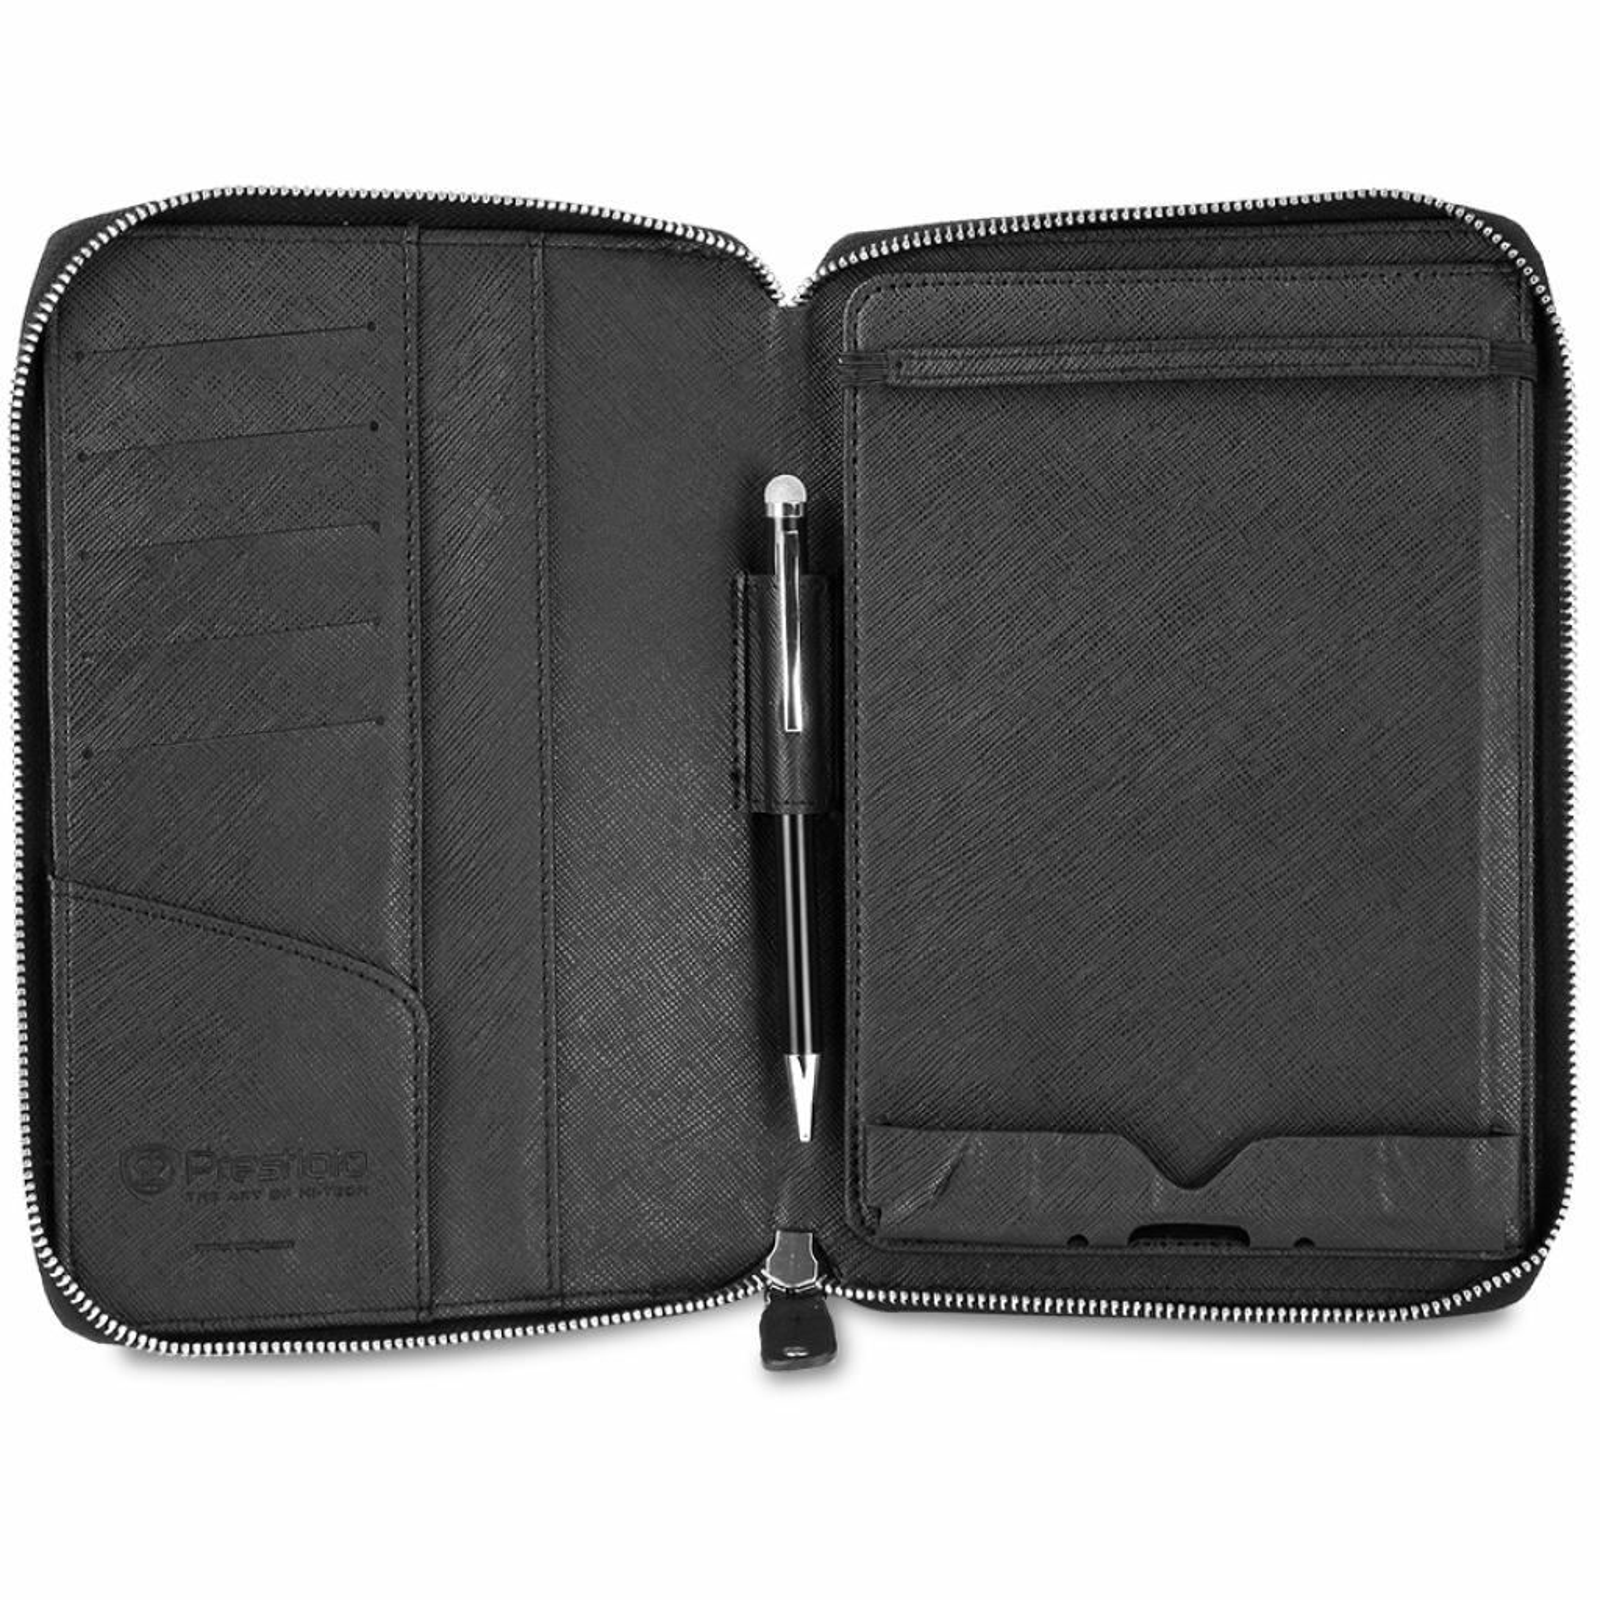 "Чехол для планшета PRESTIGIO 7"" Universal BLACK zipper+pocket (PTCL0107BK) изображение 2"